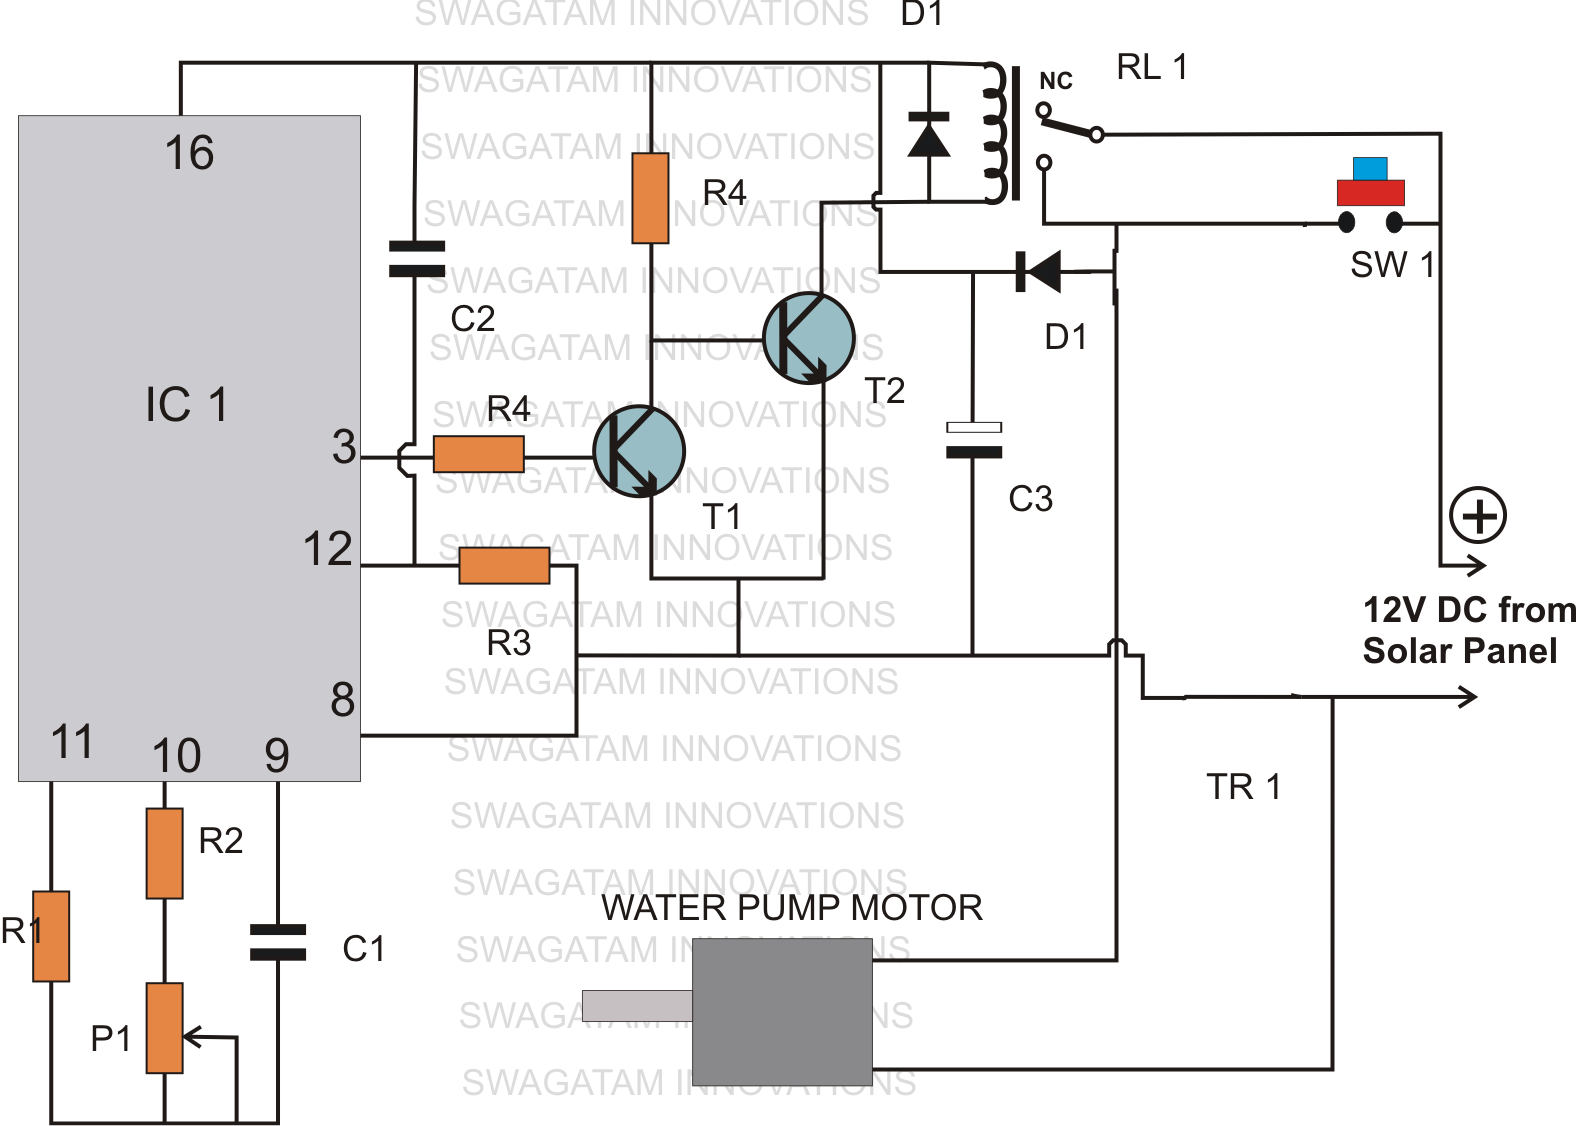 pacific hydrostar water pump wiring diagrams wiring library rh 47 yoobi de deep water well jet pumps pacific hydrostar 1 hp shallow well pump [ 1576 x 1126 Pixel ]